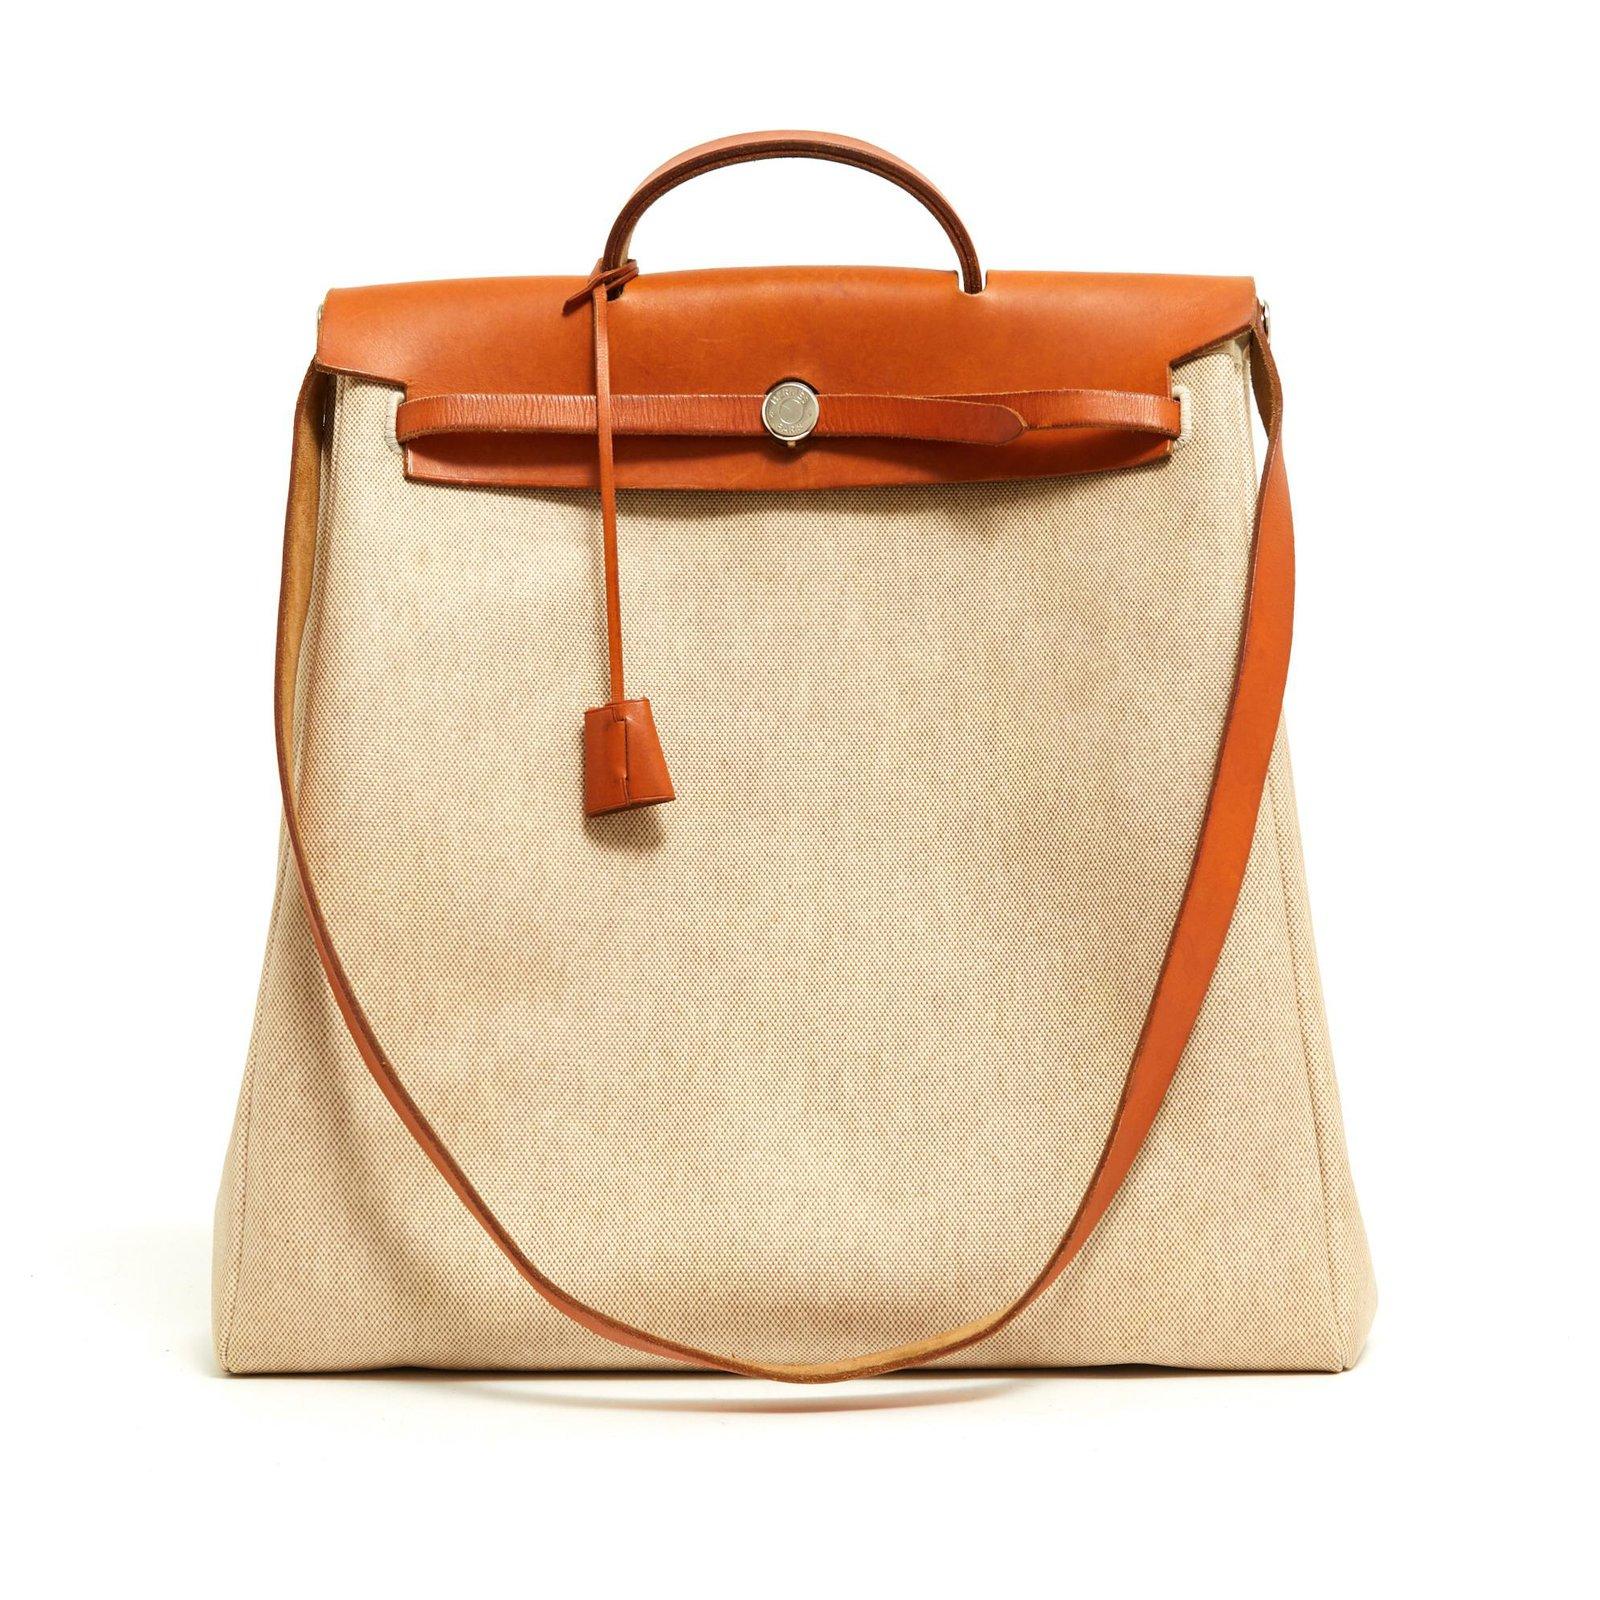 aa7eb1a6d Hermès HERBAG sizeM + MM NATURAL Handbags Leather,Cloth,Metal Beige,Caramel  ref